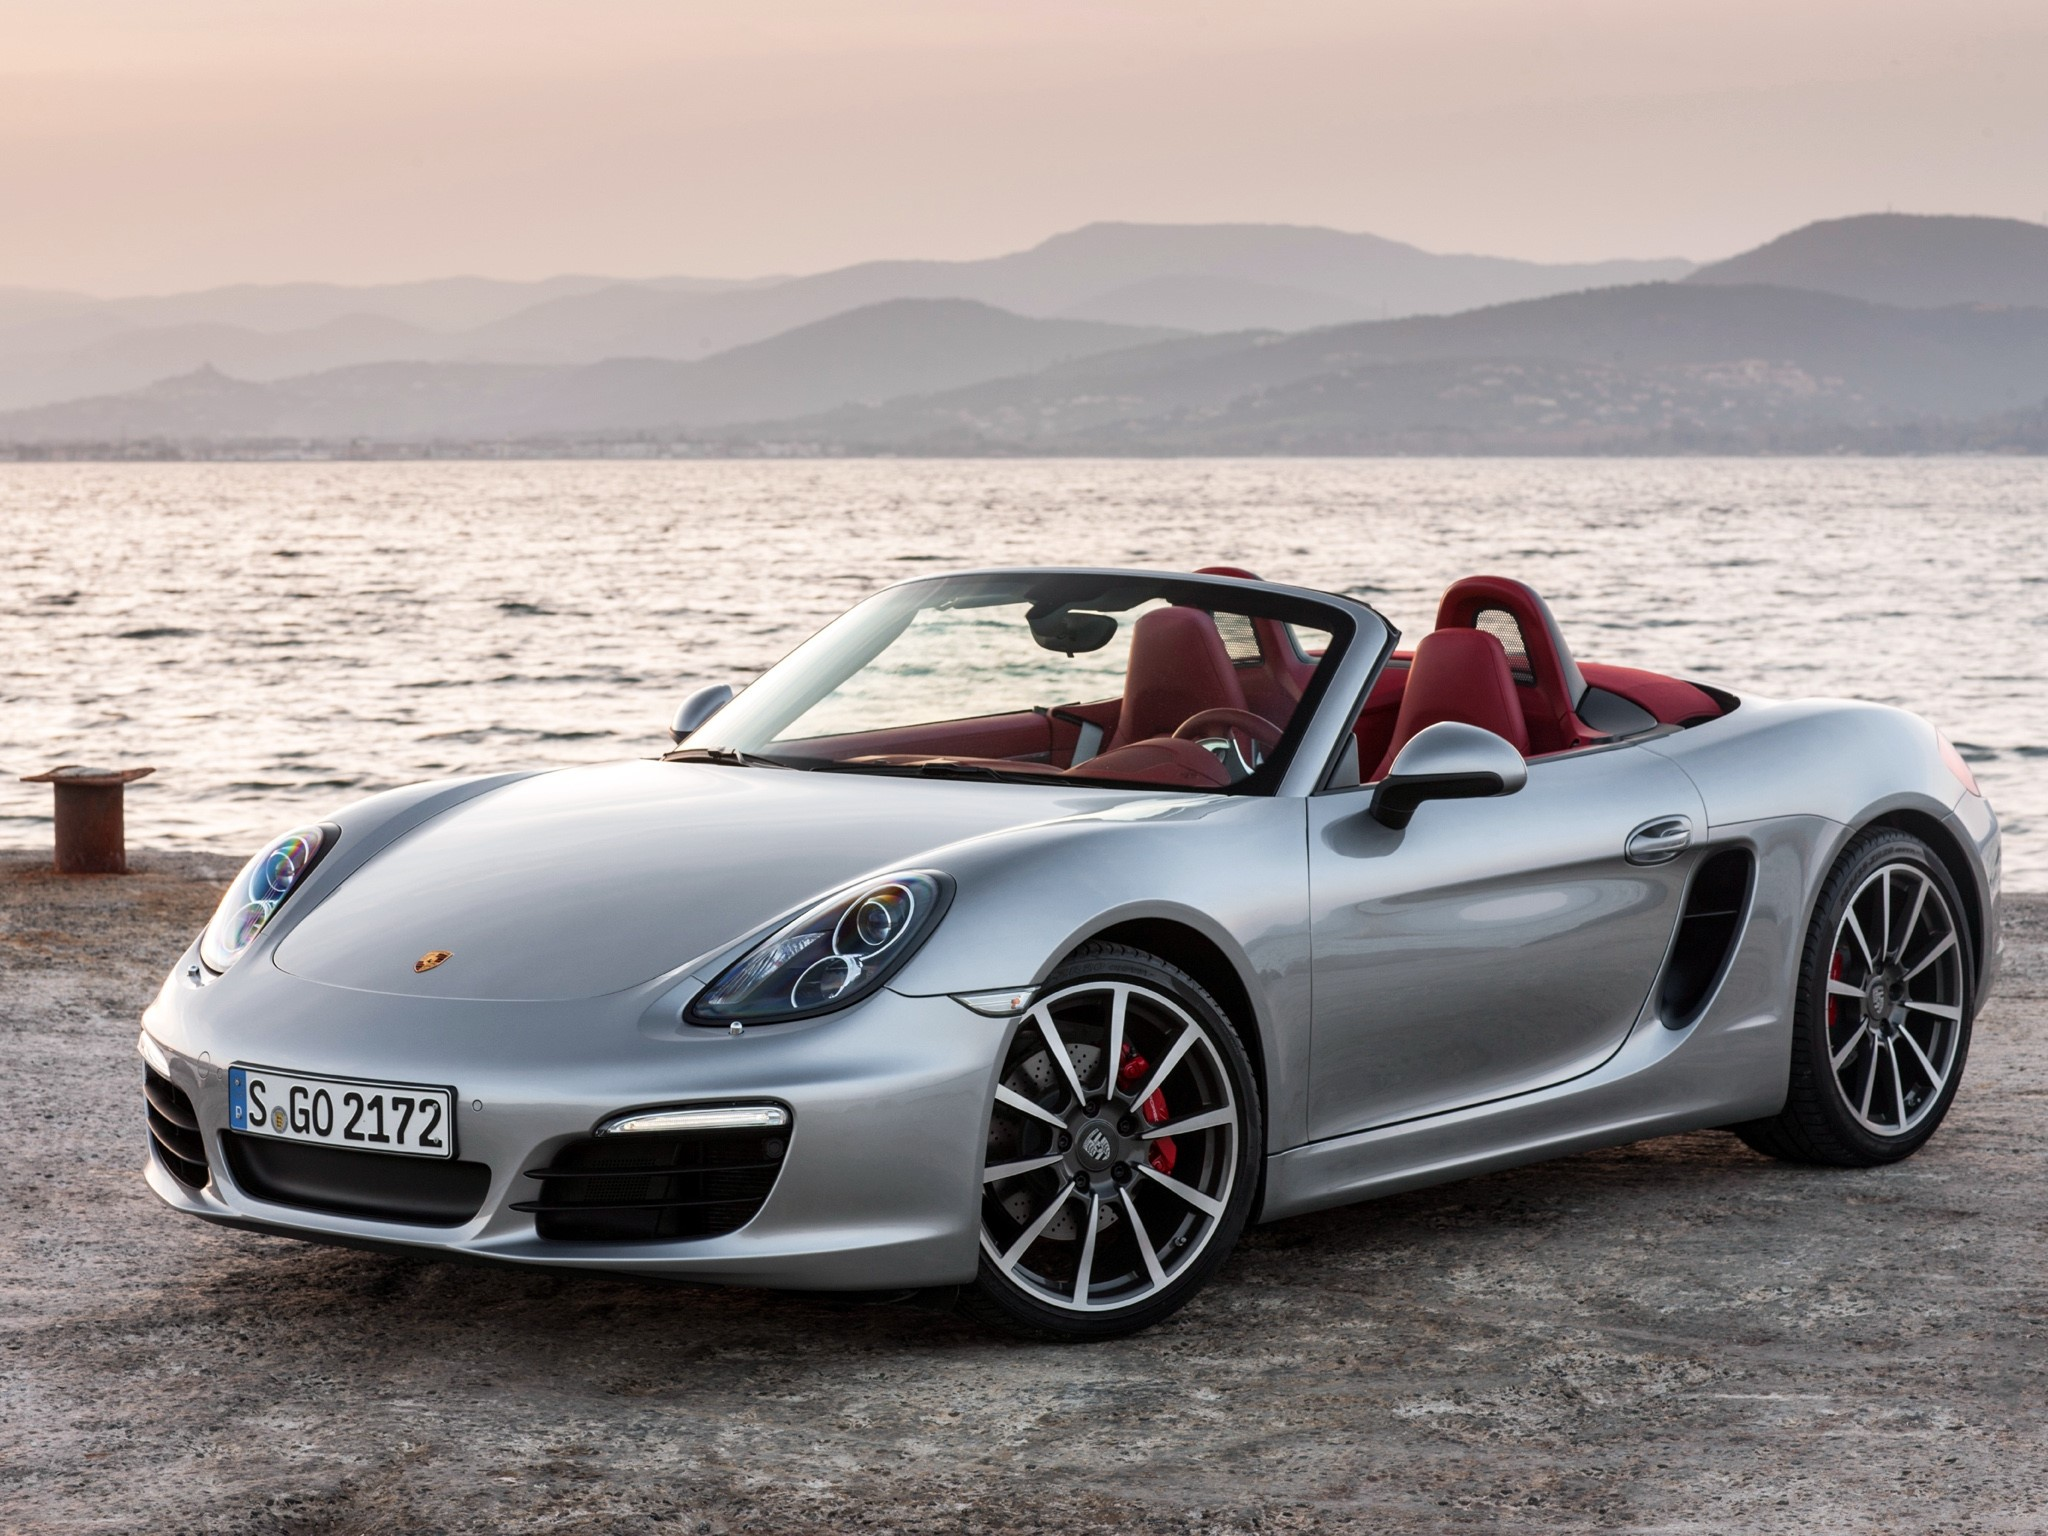 Porsche Boxster Spyder Pics